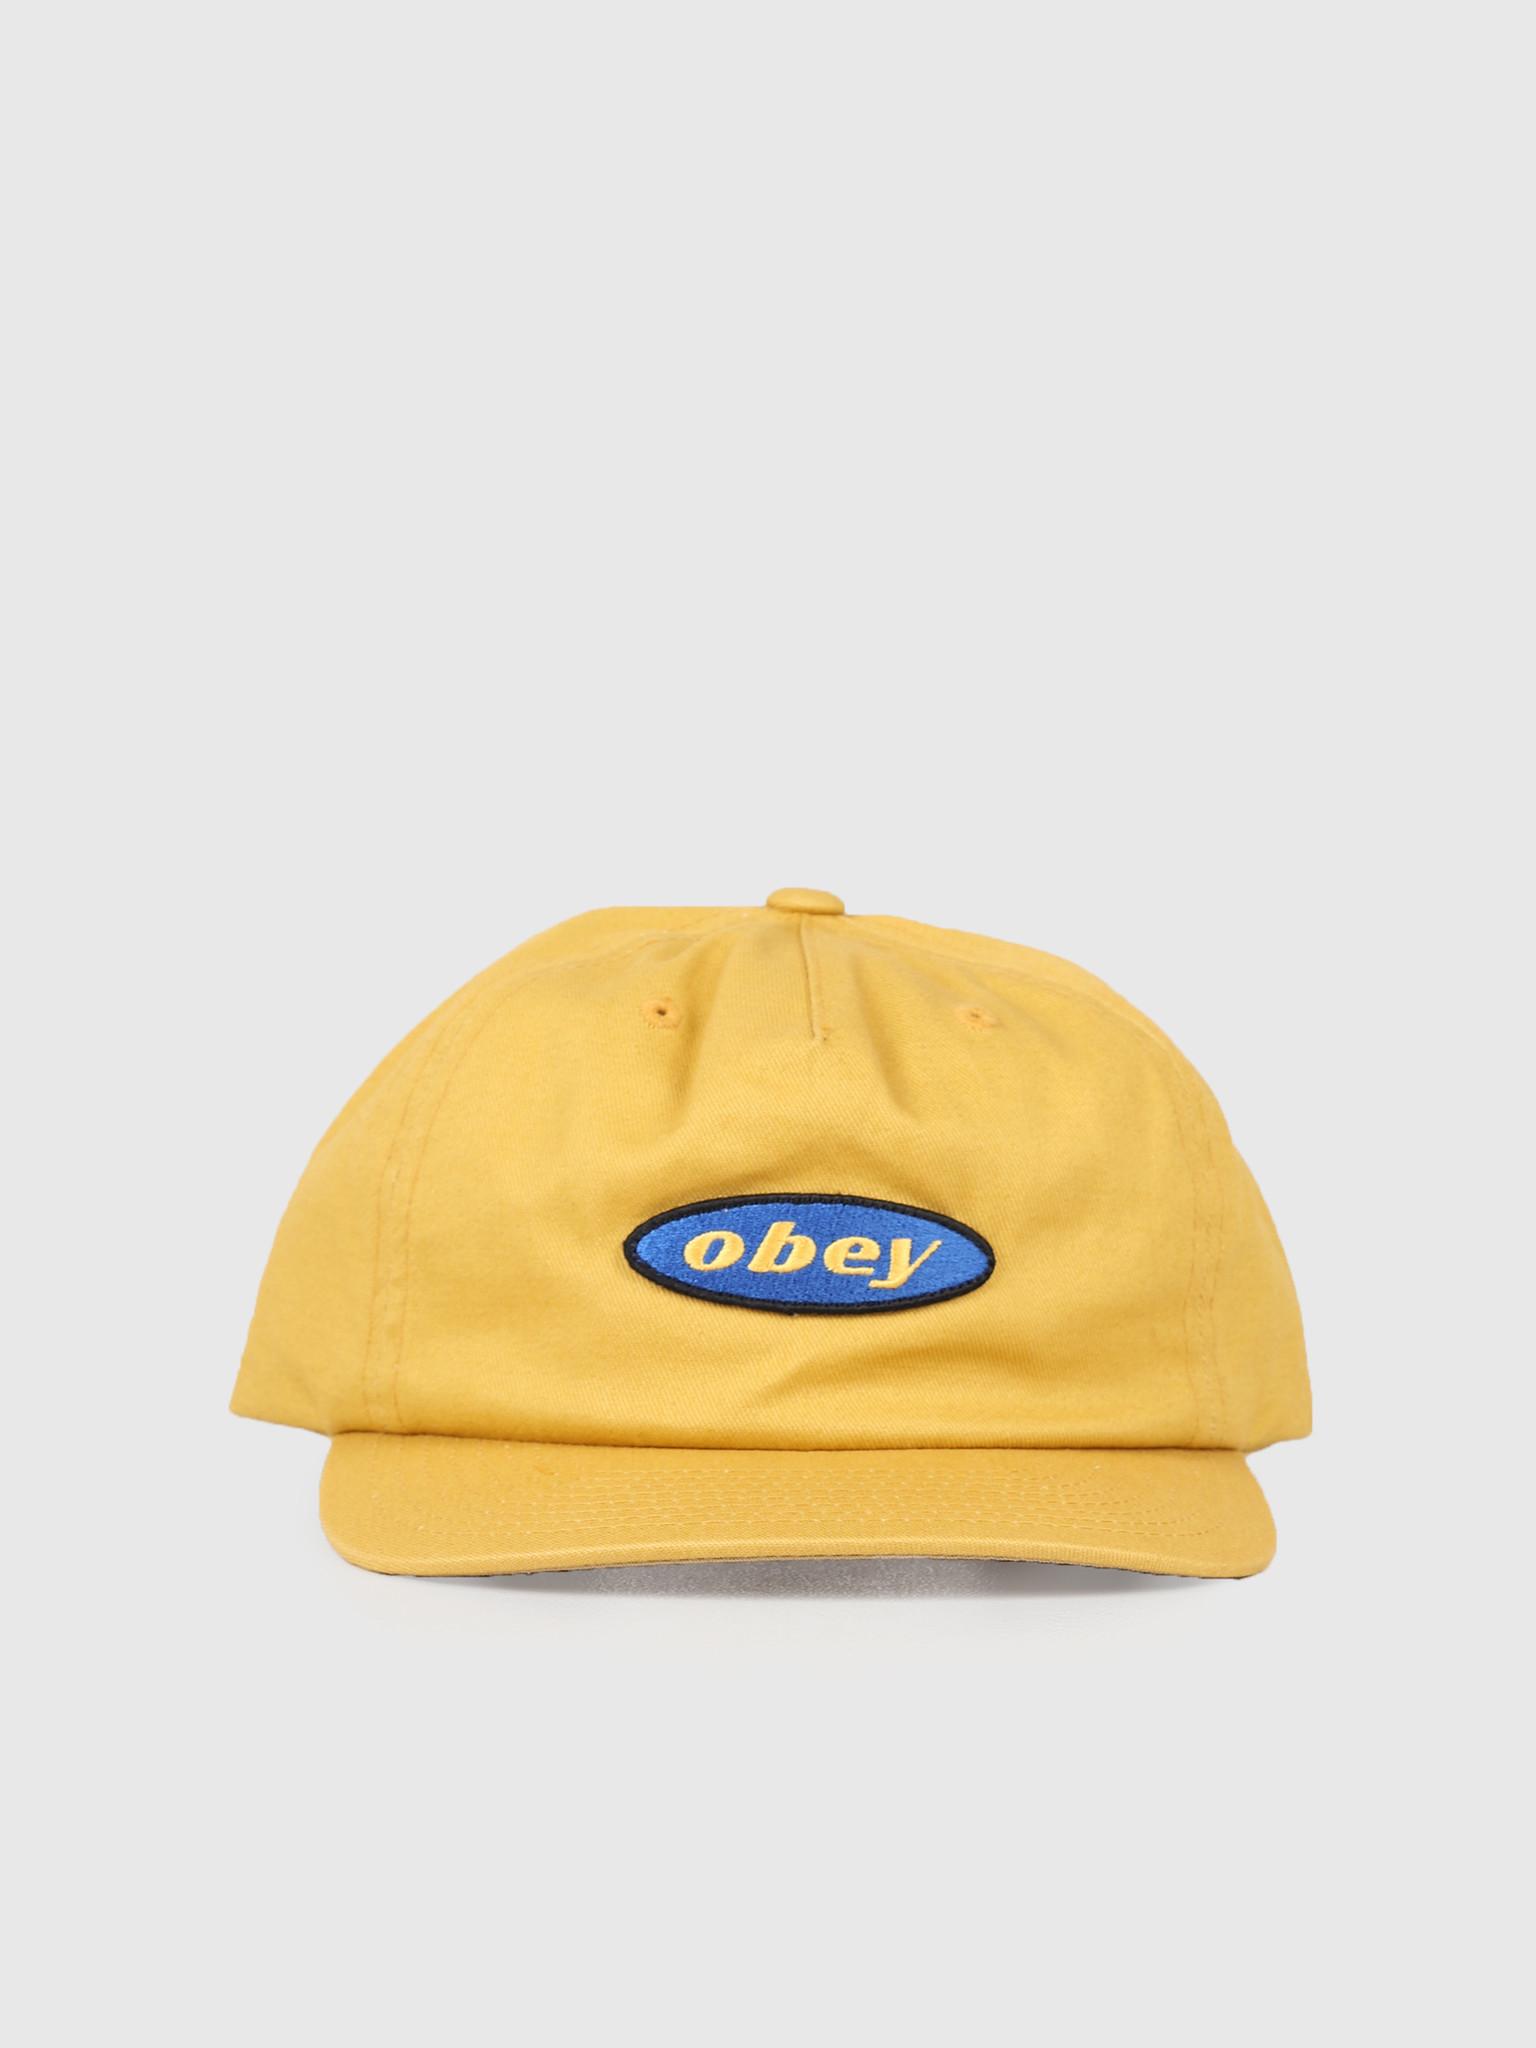 Obey Obey Rotation Snapback Golden Palm 100570098-GPM